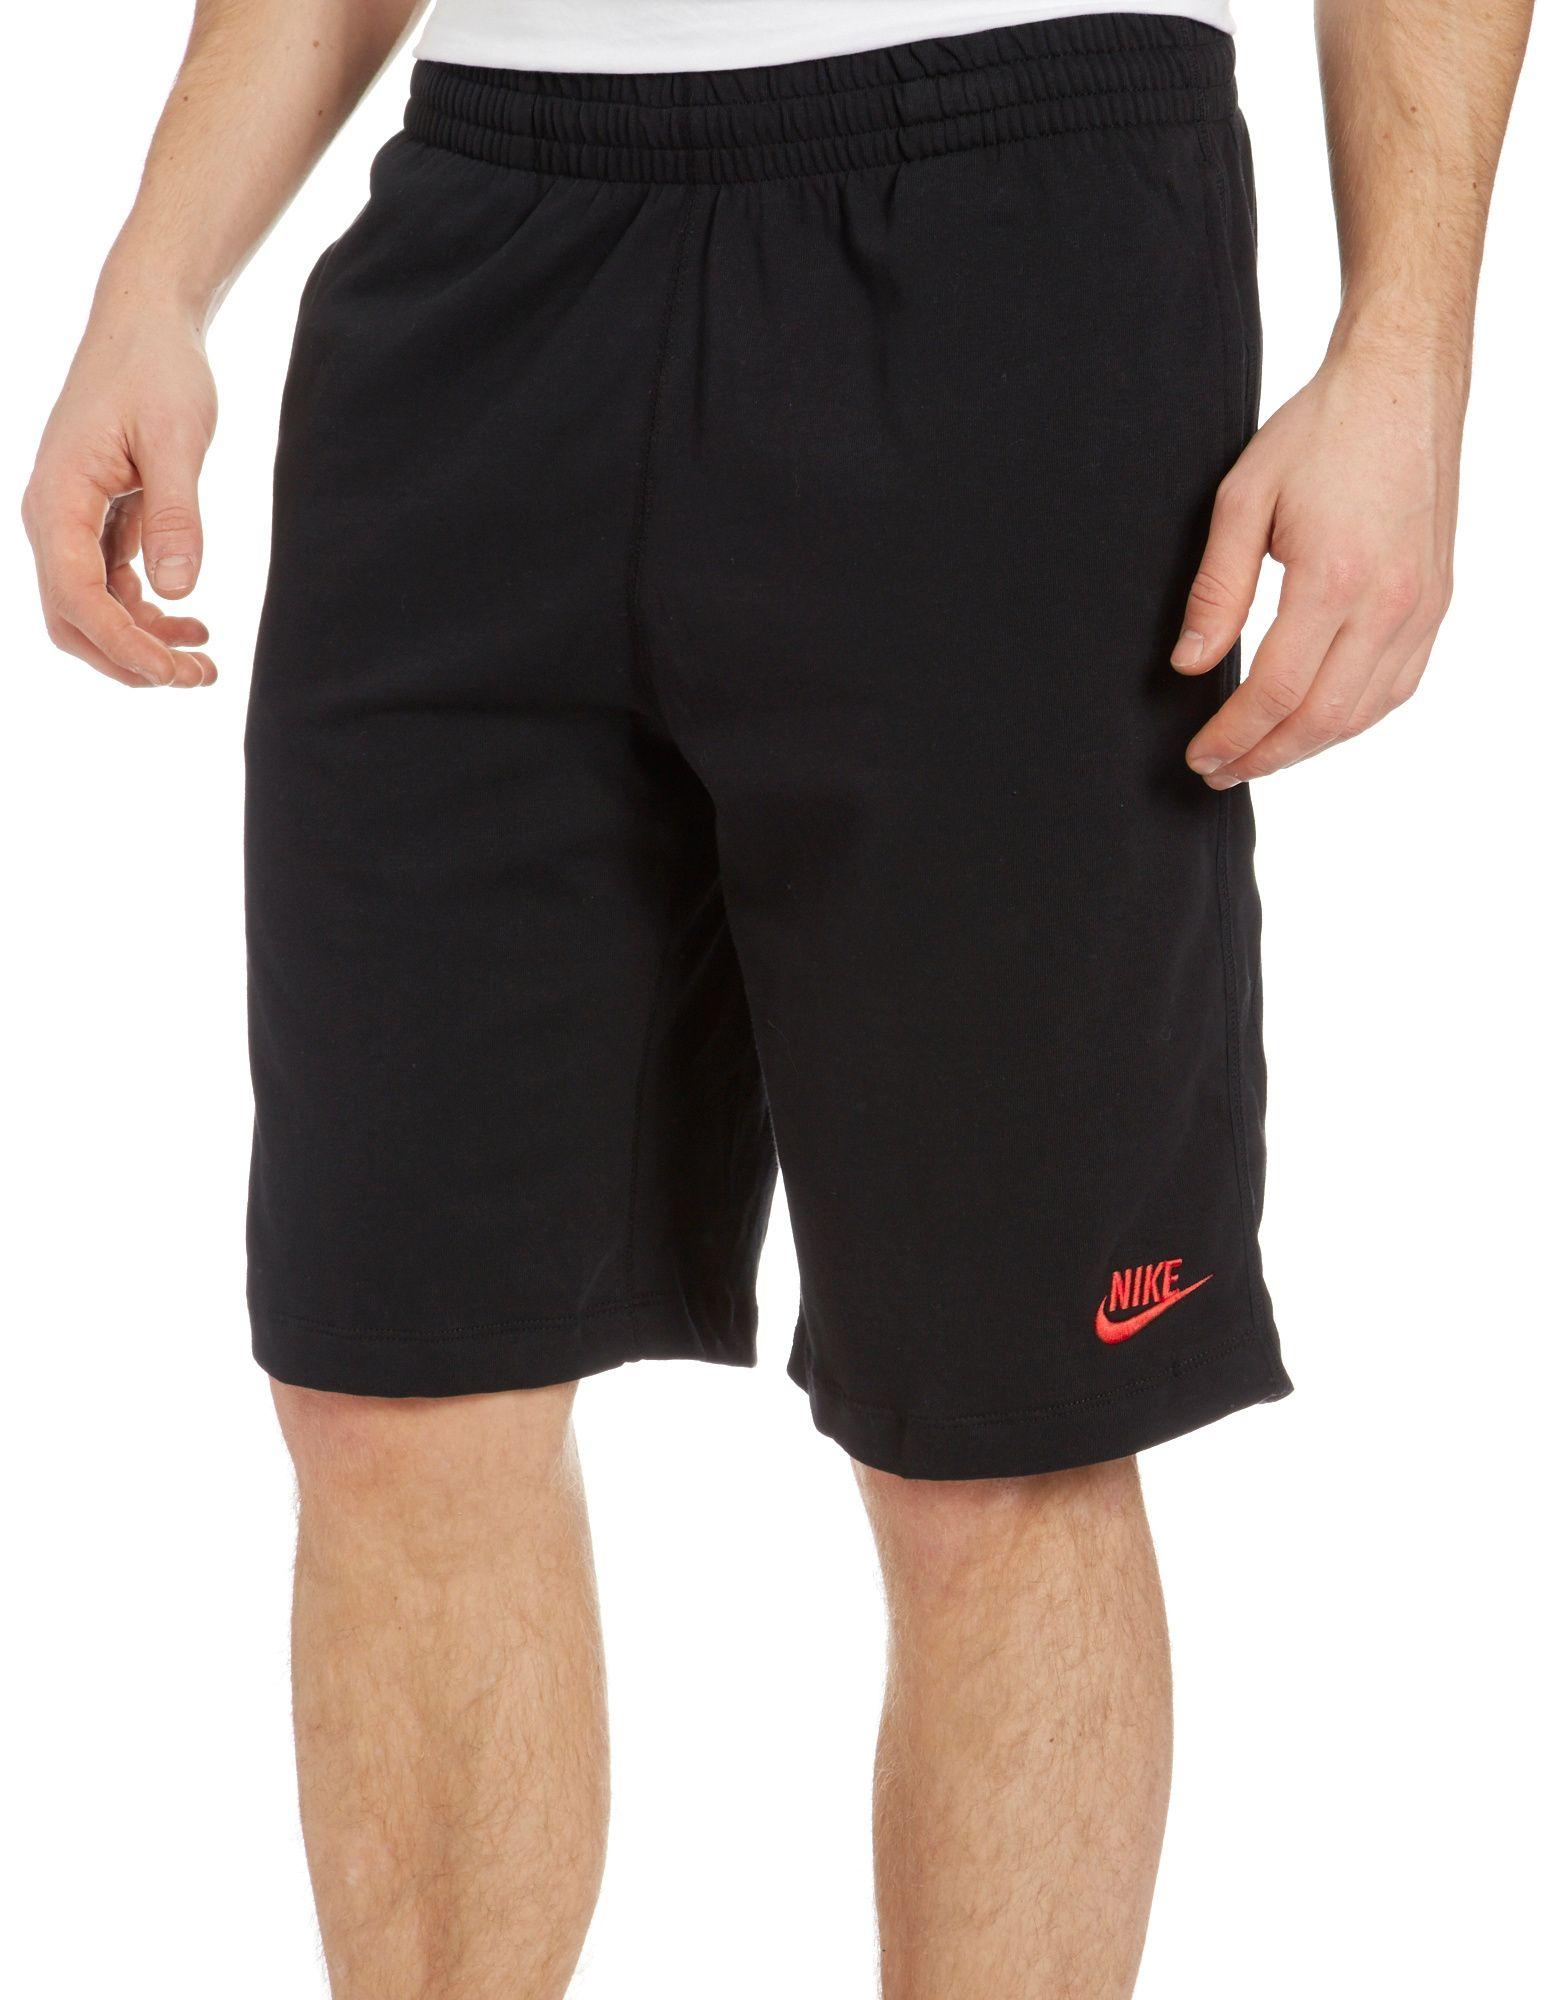 Nike Foundation Jersey Shorts